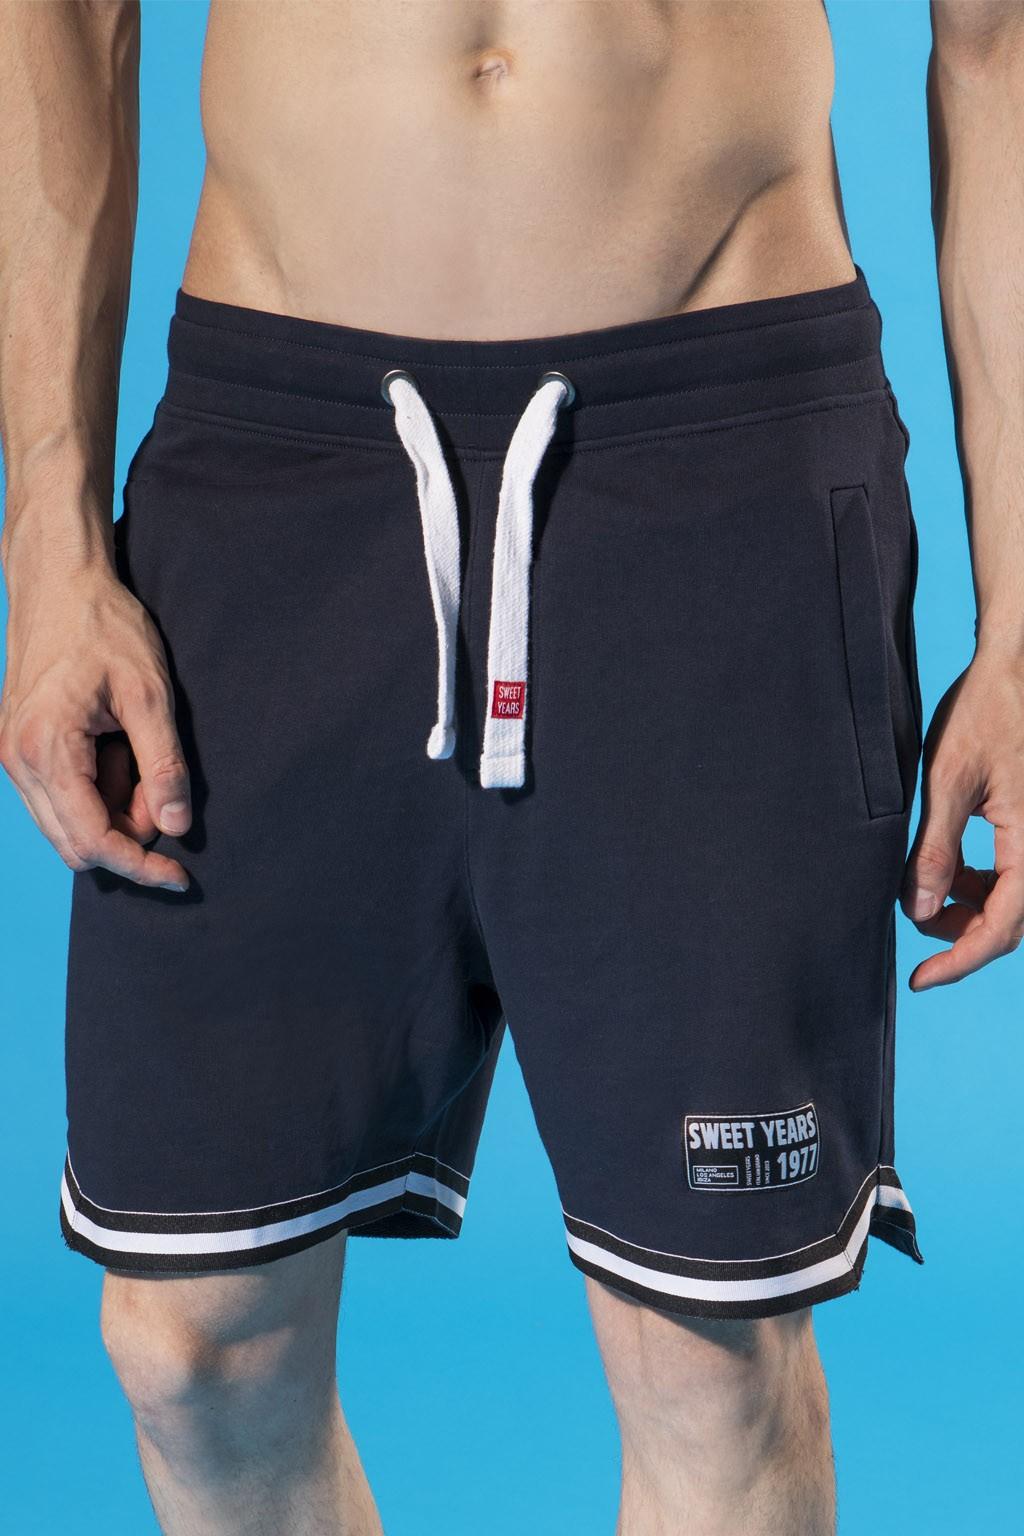 Pantaloncini da uomo in felpa leggera con stampa ed etichetta Sweet Years.